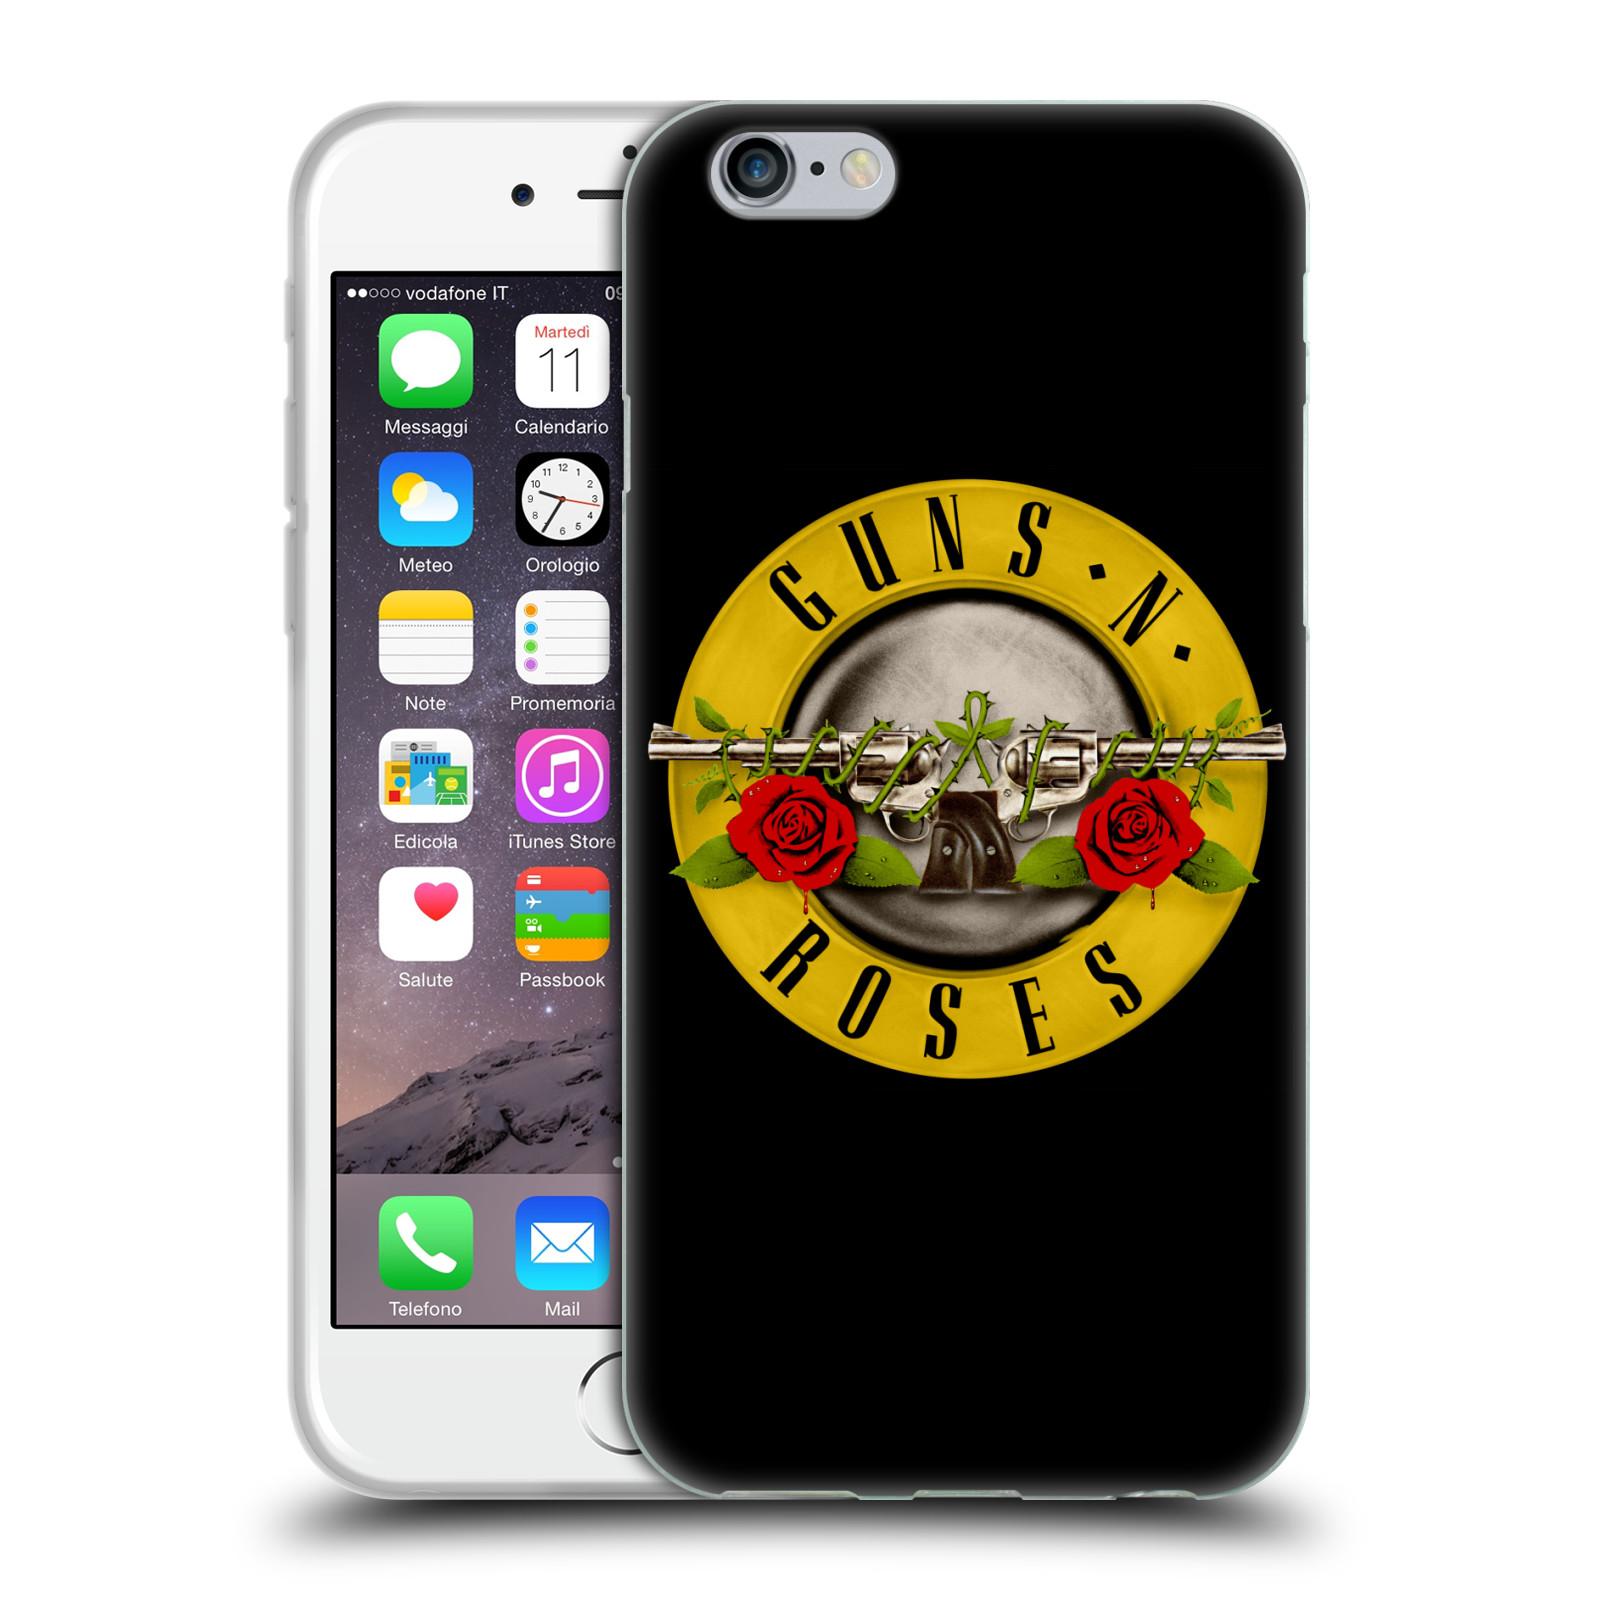 HEAD CASE silikonový obal na mobil Apple Iphone 6/6S hudební skupina Guns N Roses